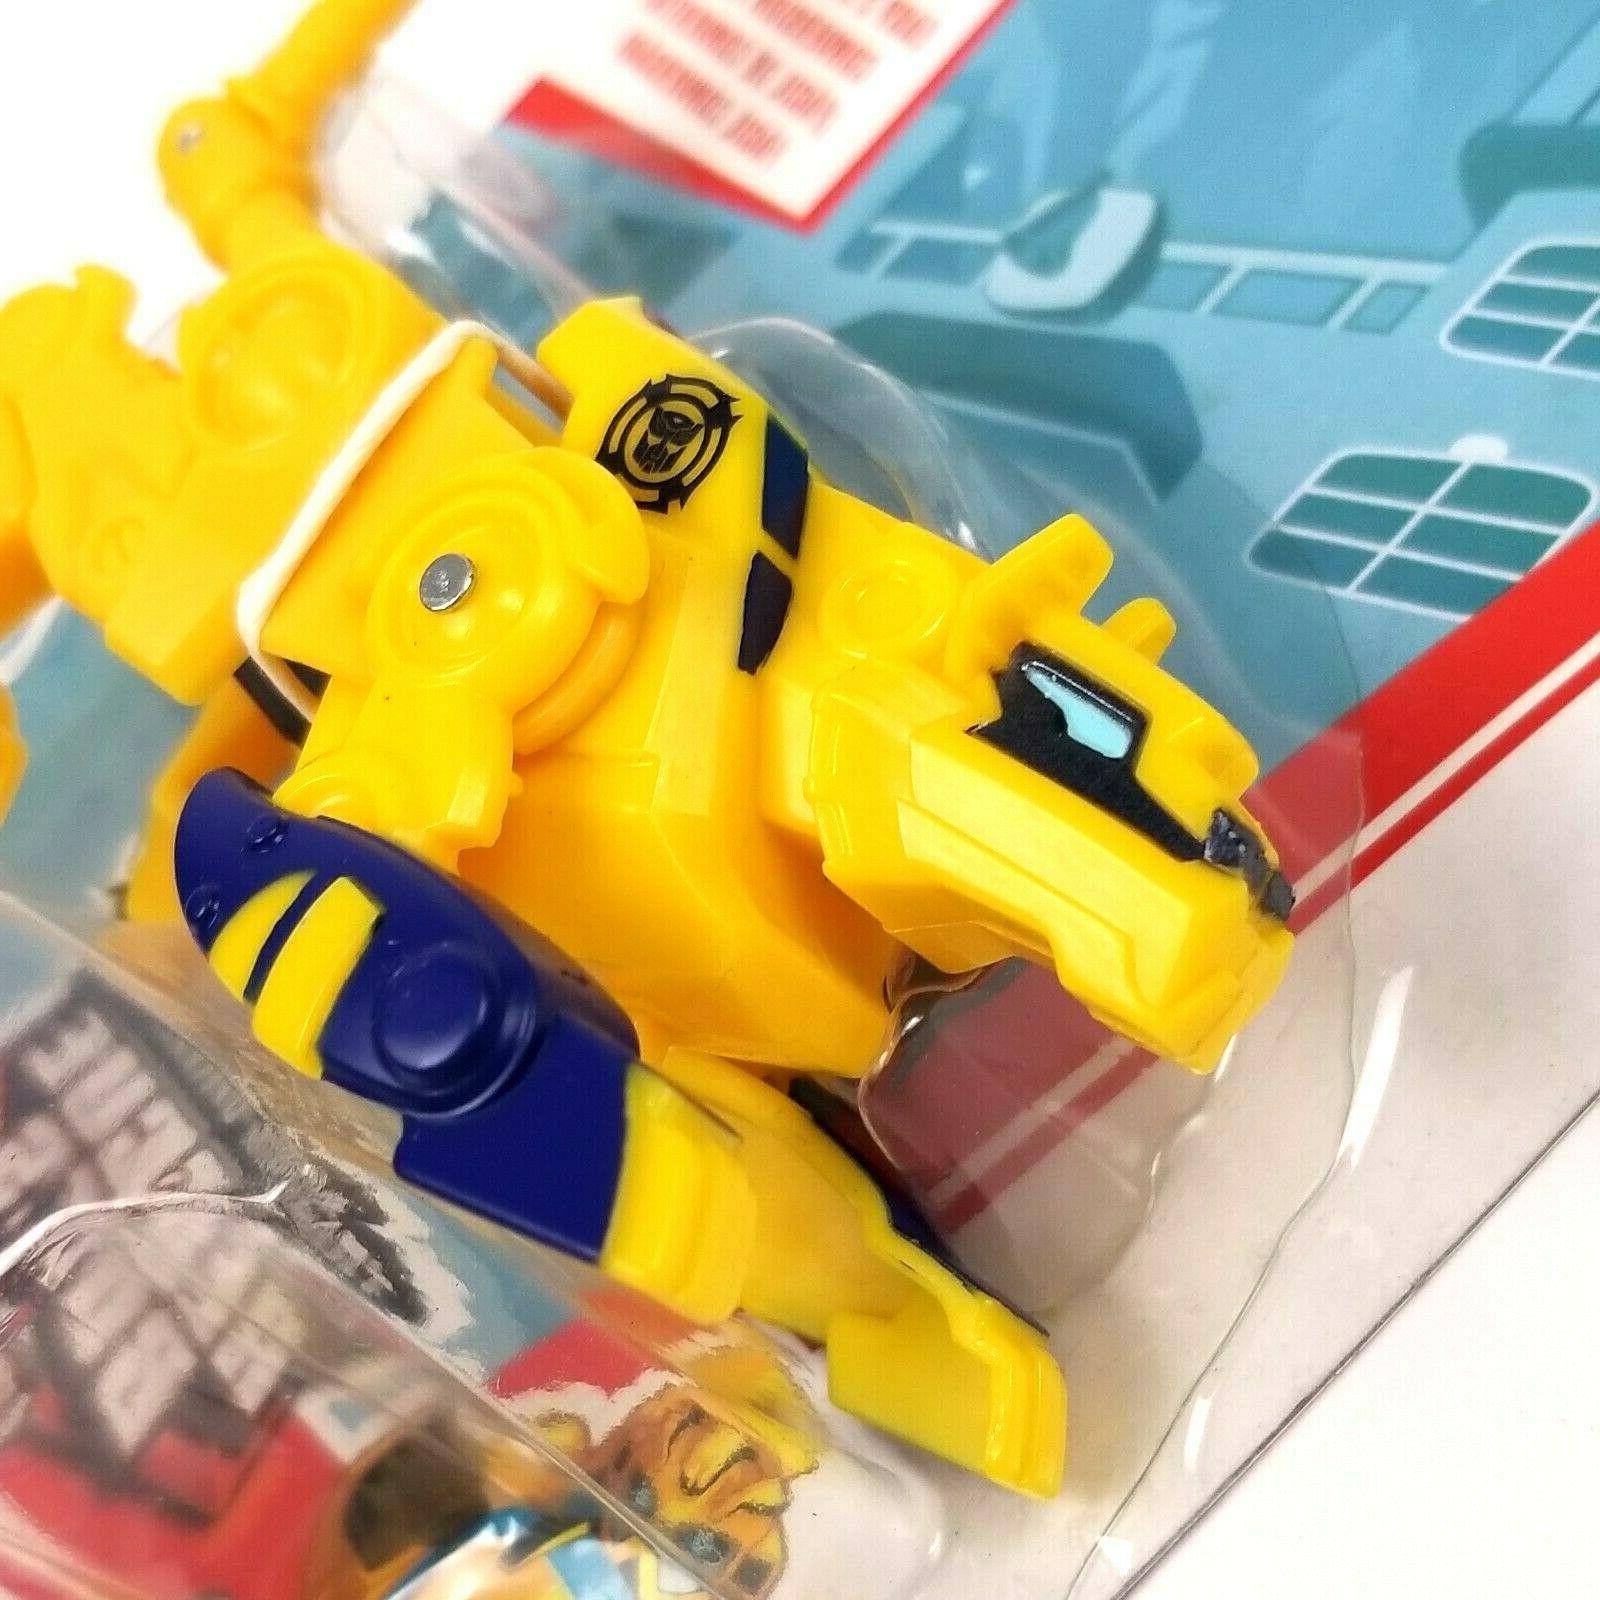 Playskool Bots - Cheetah Bot Figure